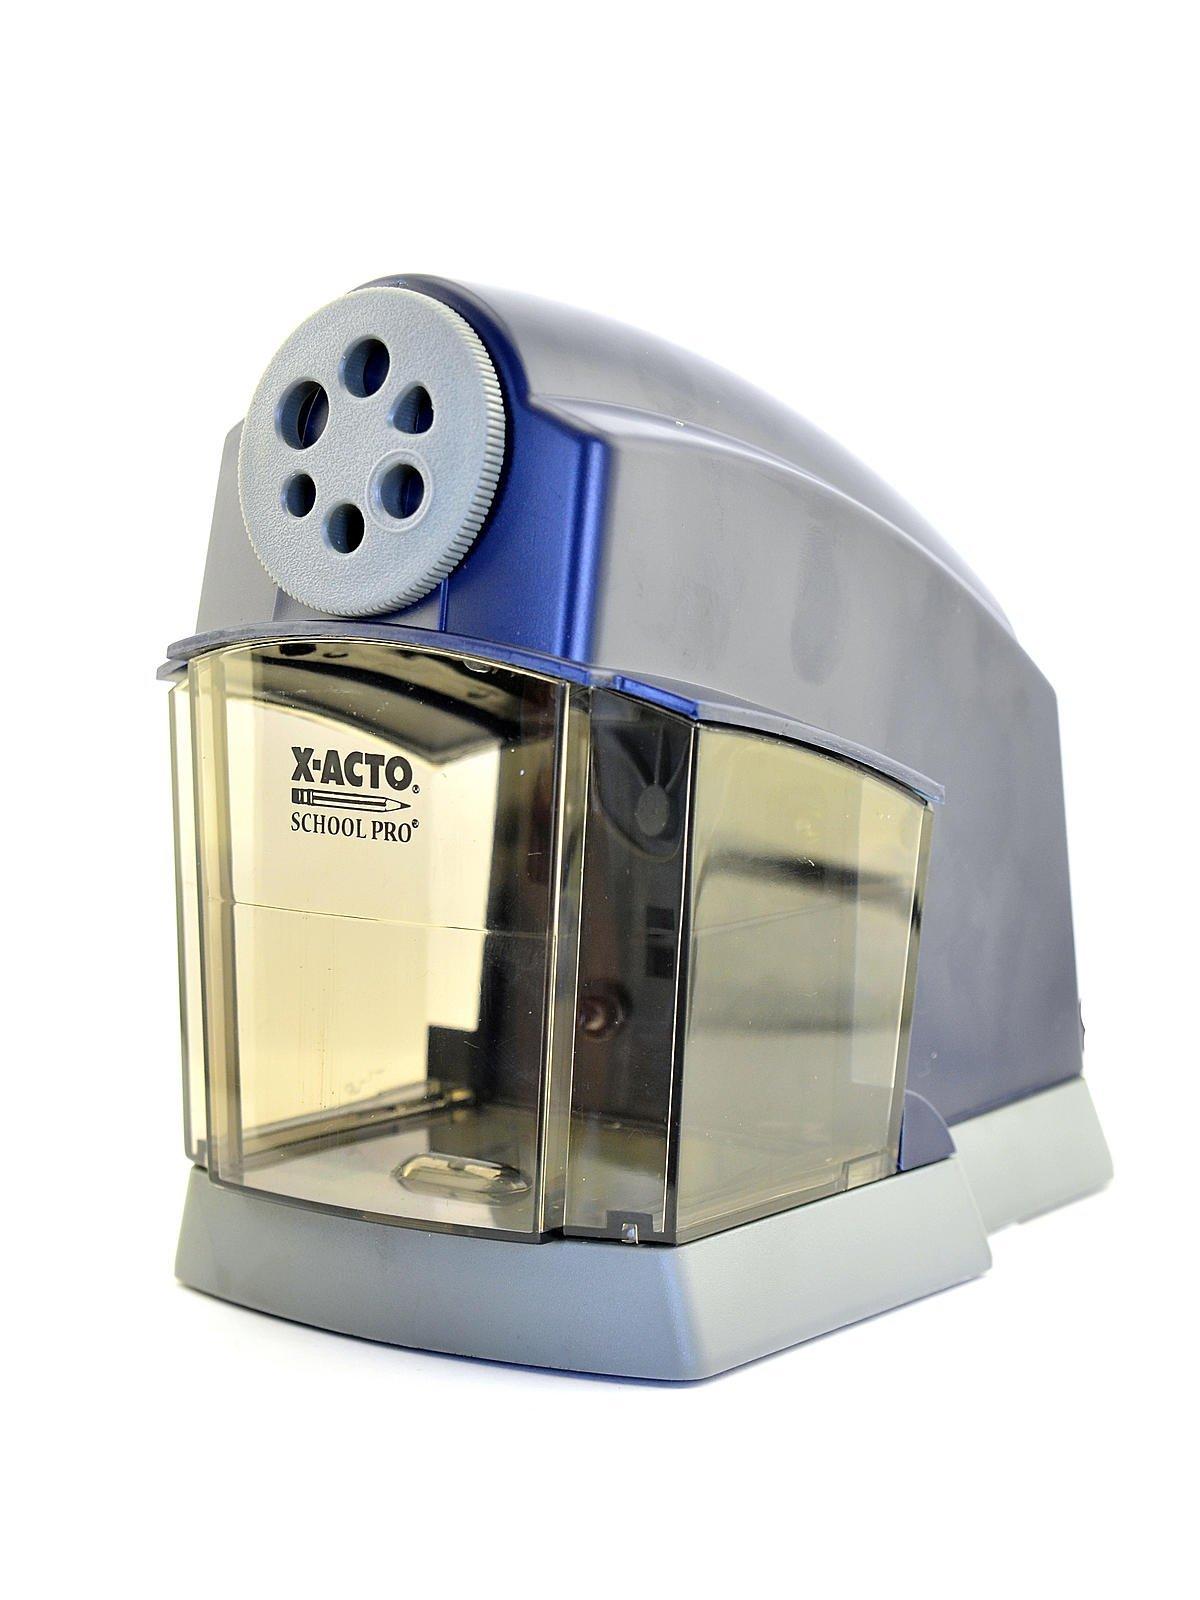 X-Acto Boston School Pro Electric Pencil Sharpener 1 pcs sku# 1832870MA